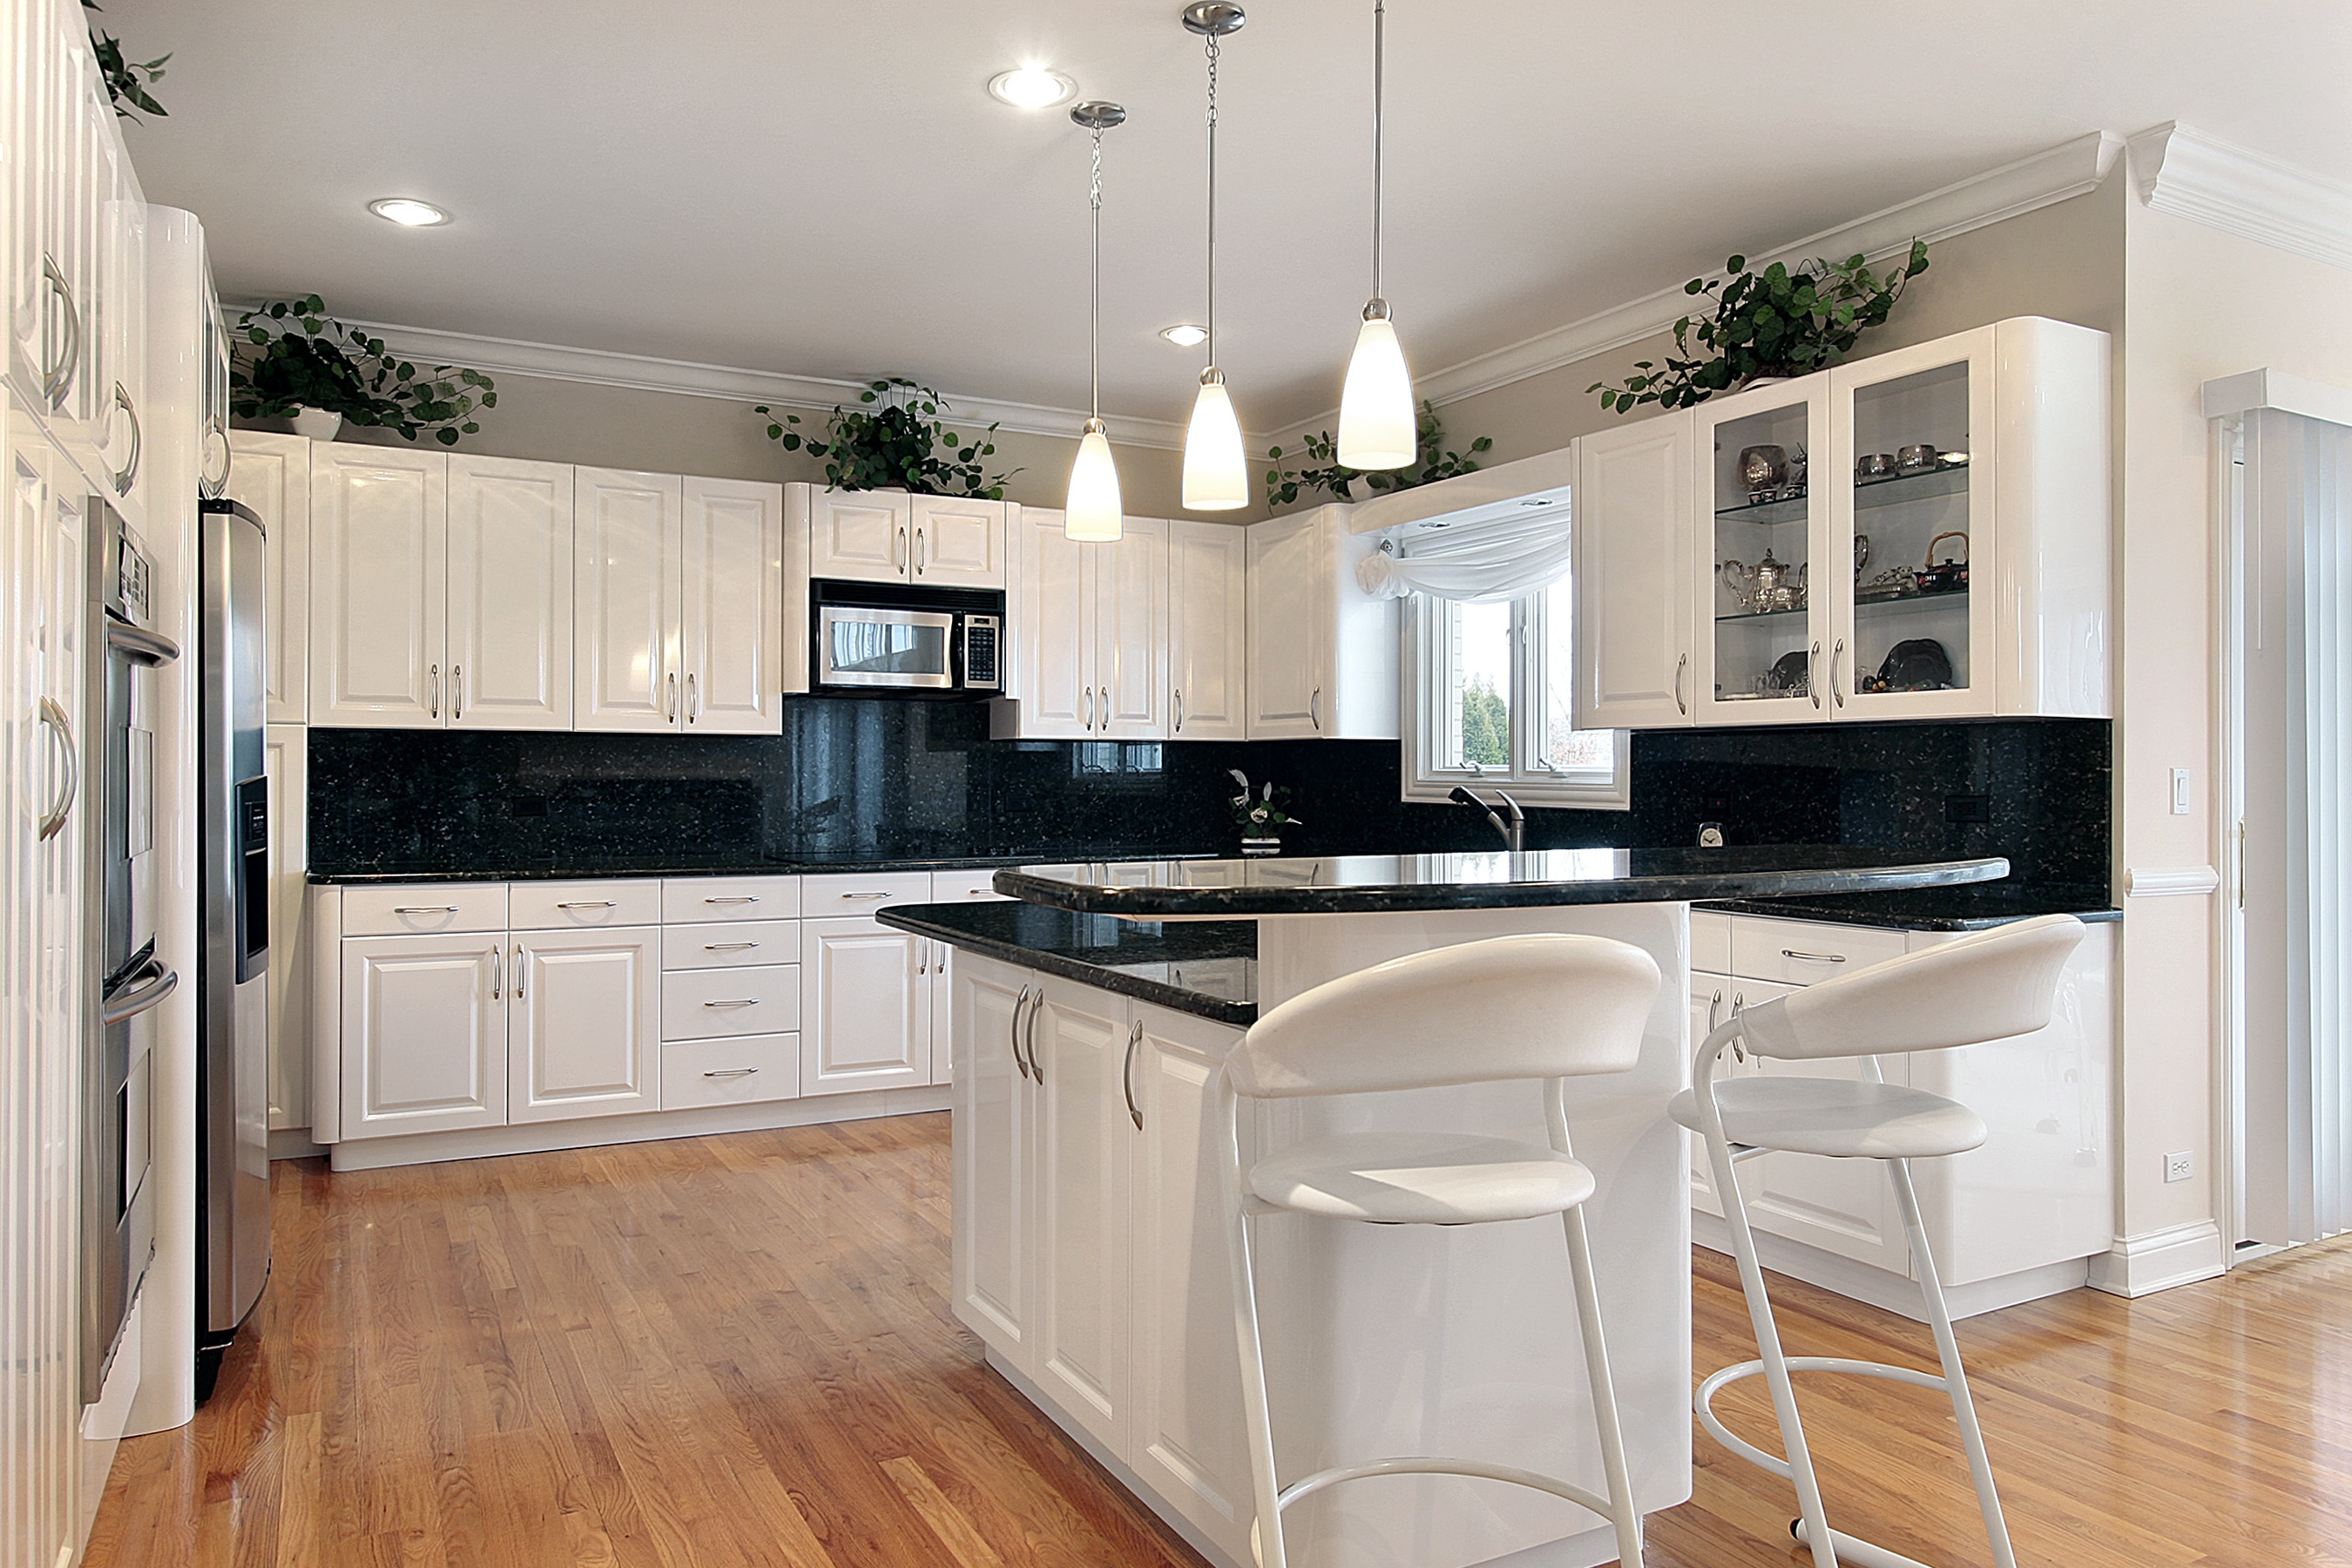 Backsplash Ideas For Your White Shaker Kitchen Best Online Cabinets